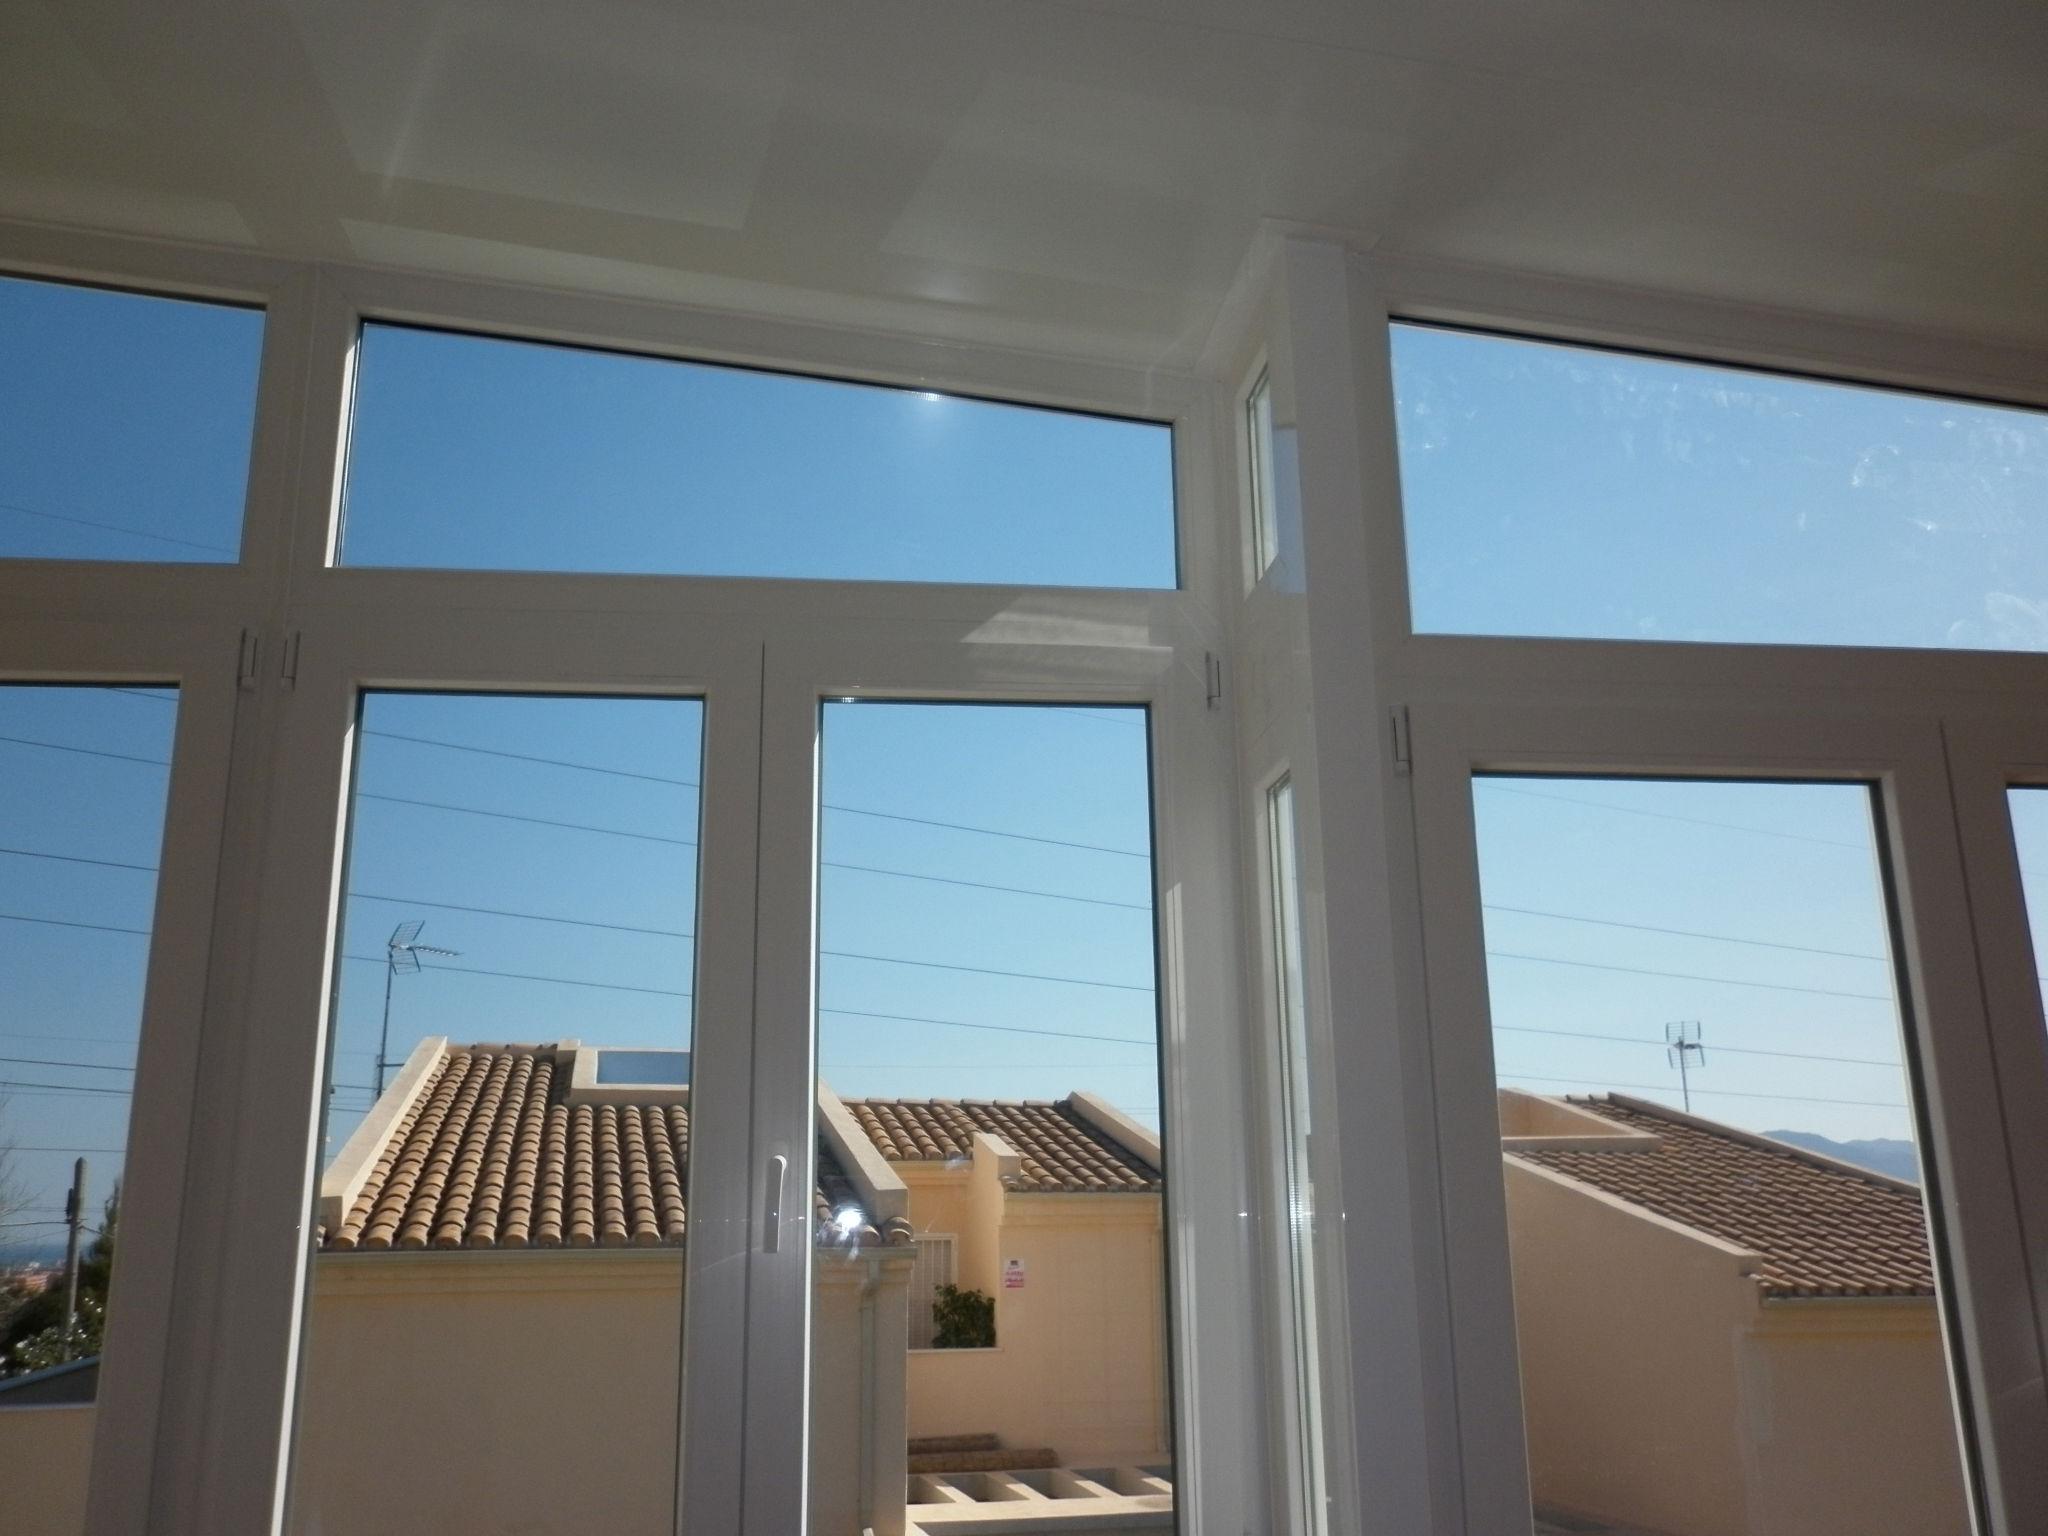 Foto 32 de Carpintería de aluminio, metálica y PVC en Málaga | Aluminios Alunoe